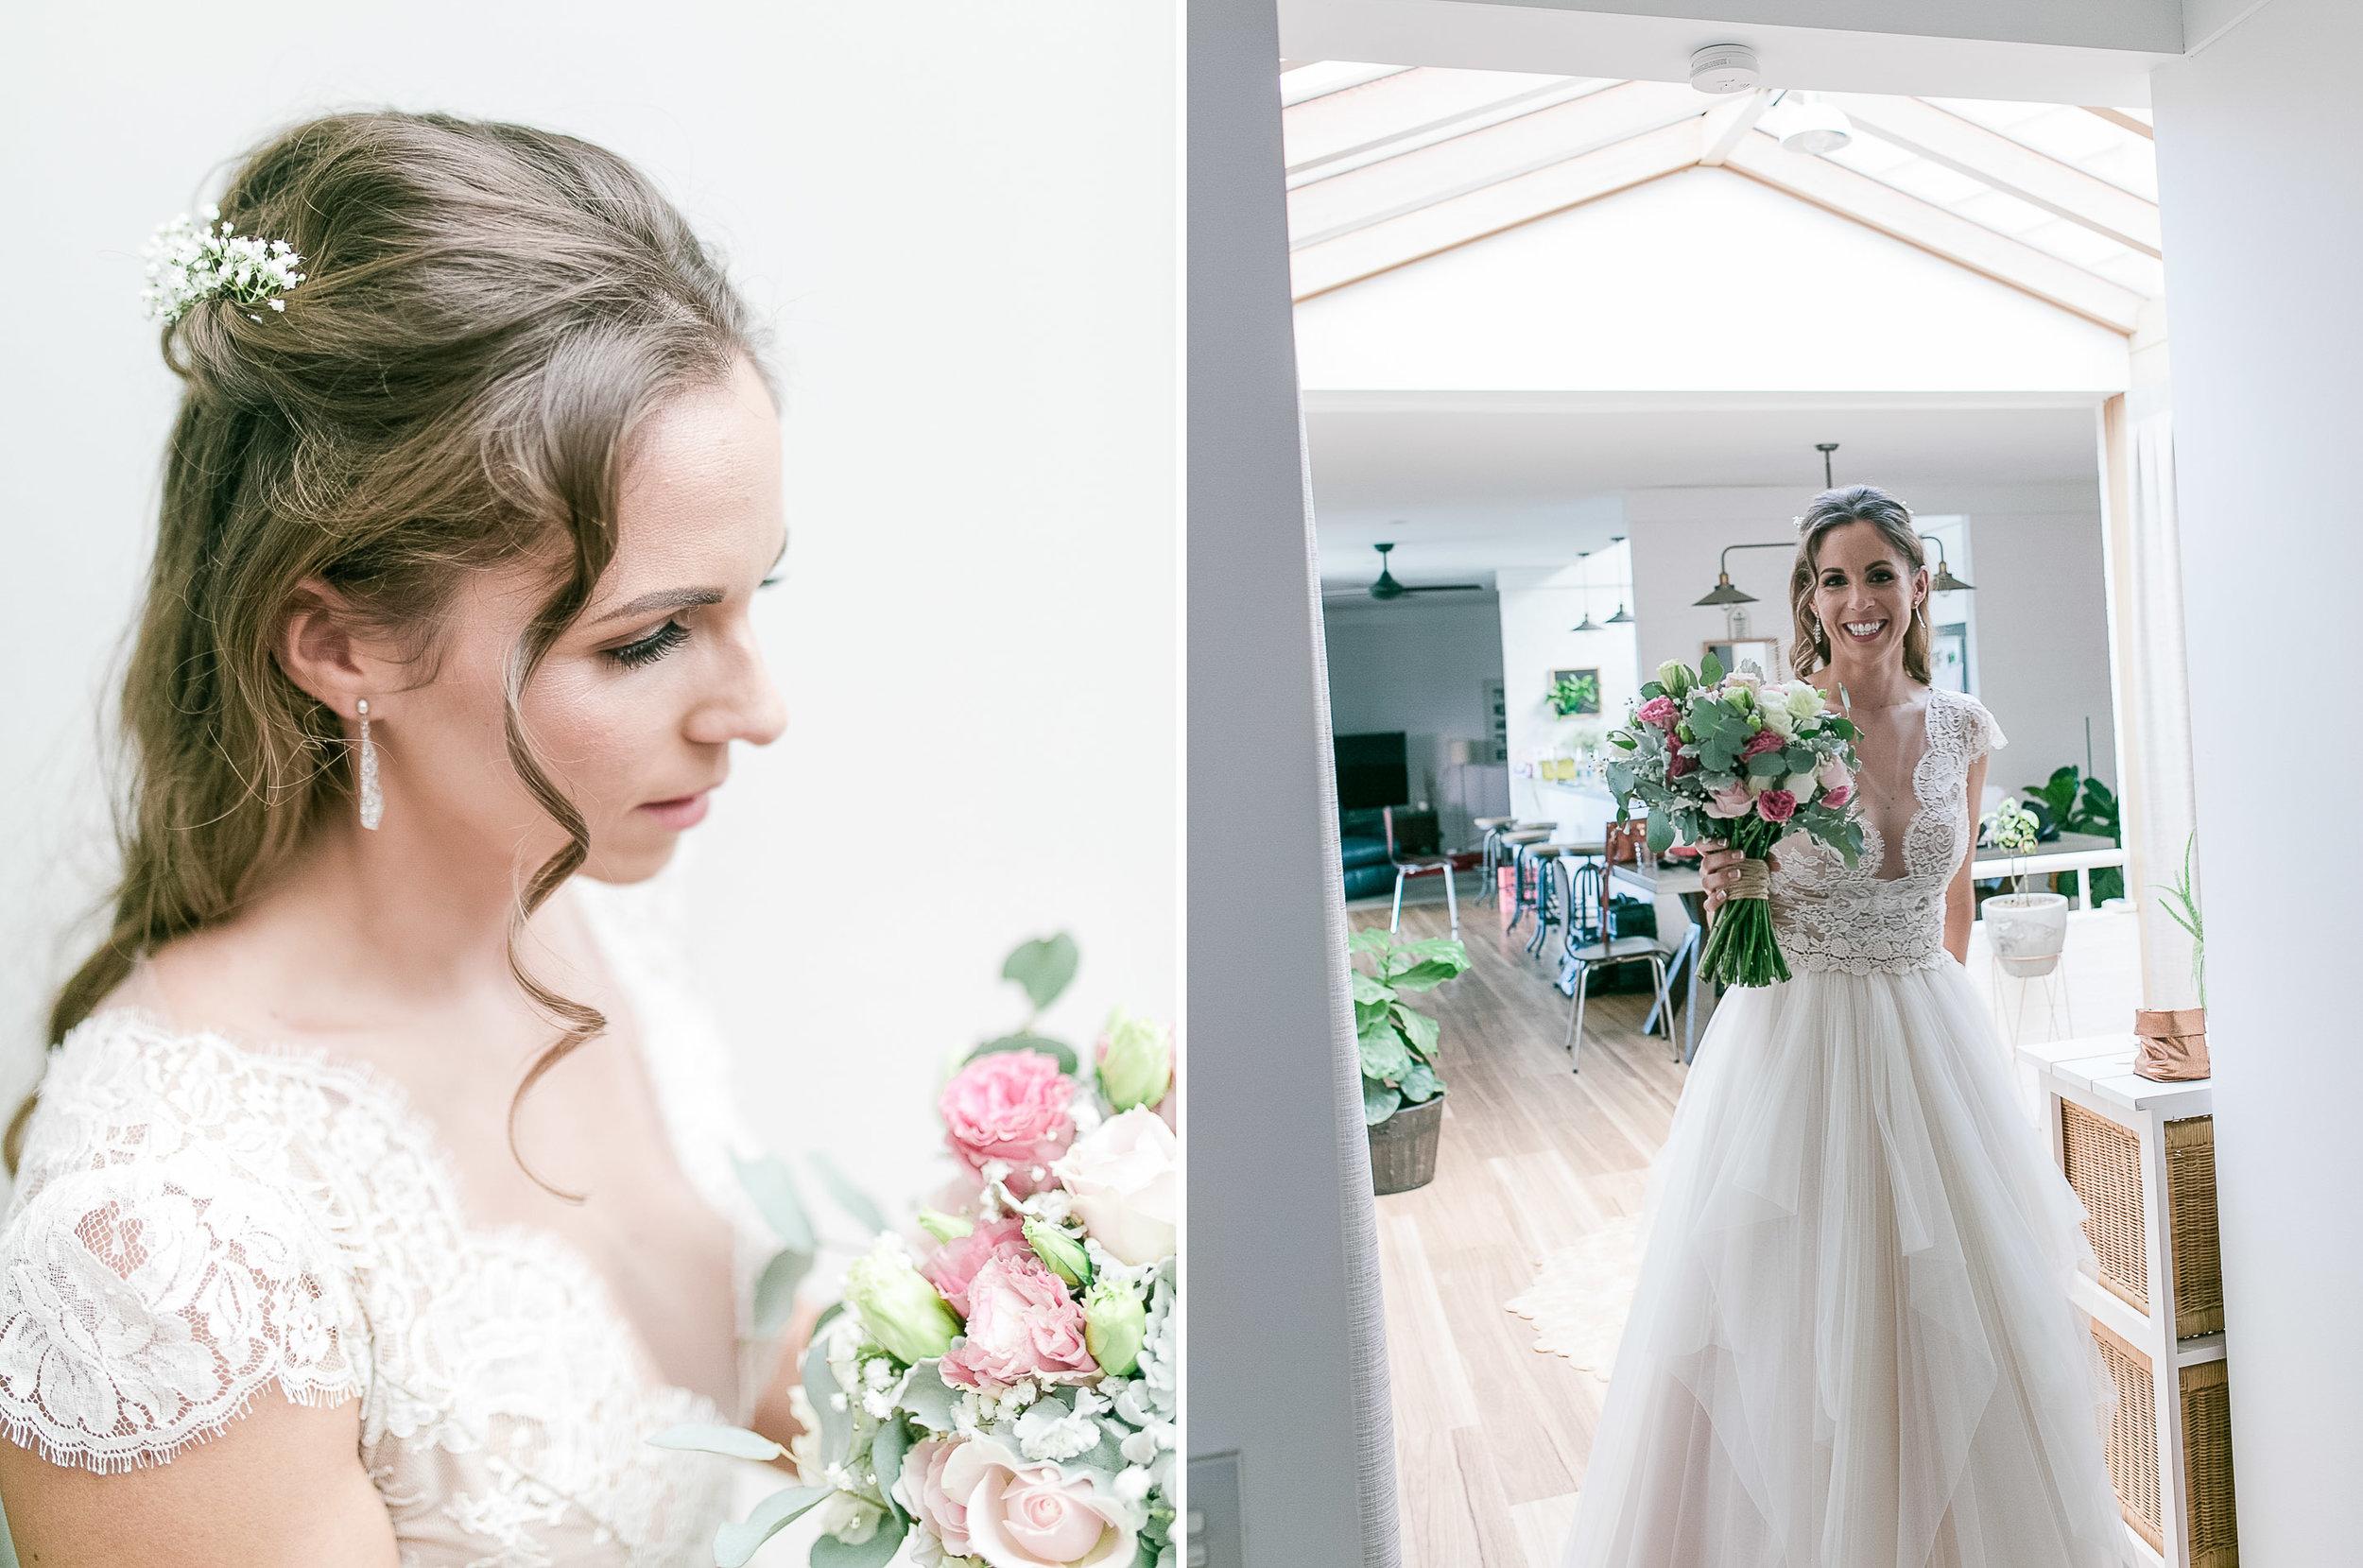 True North Photography_Boomerang Farm_Amy and Michael_Getting ready_Wedding Dress_Gold Coast Wedding_Flowers-2.jpg